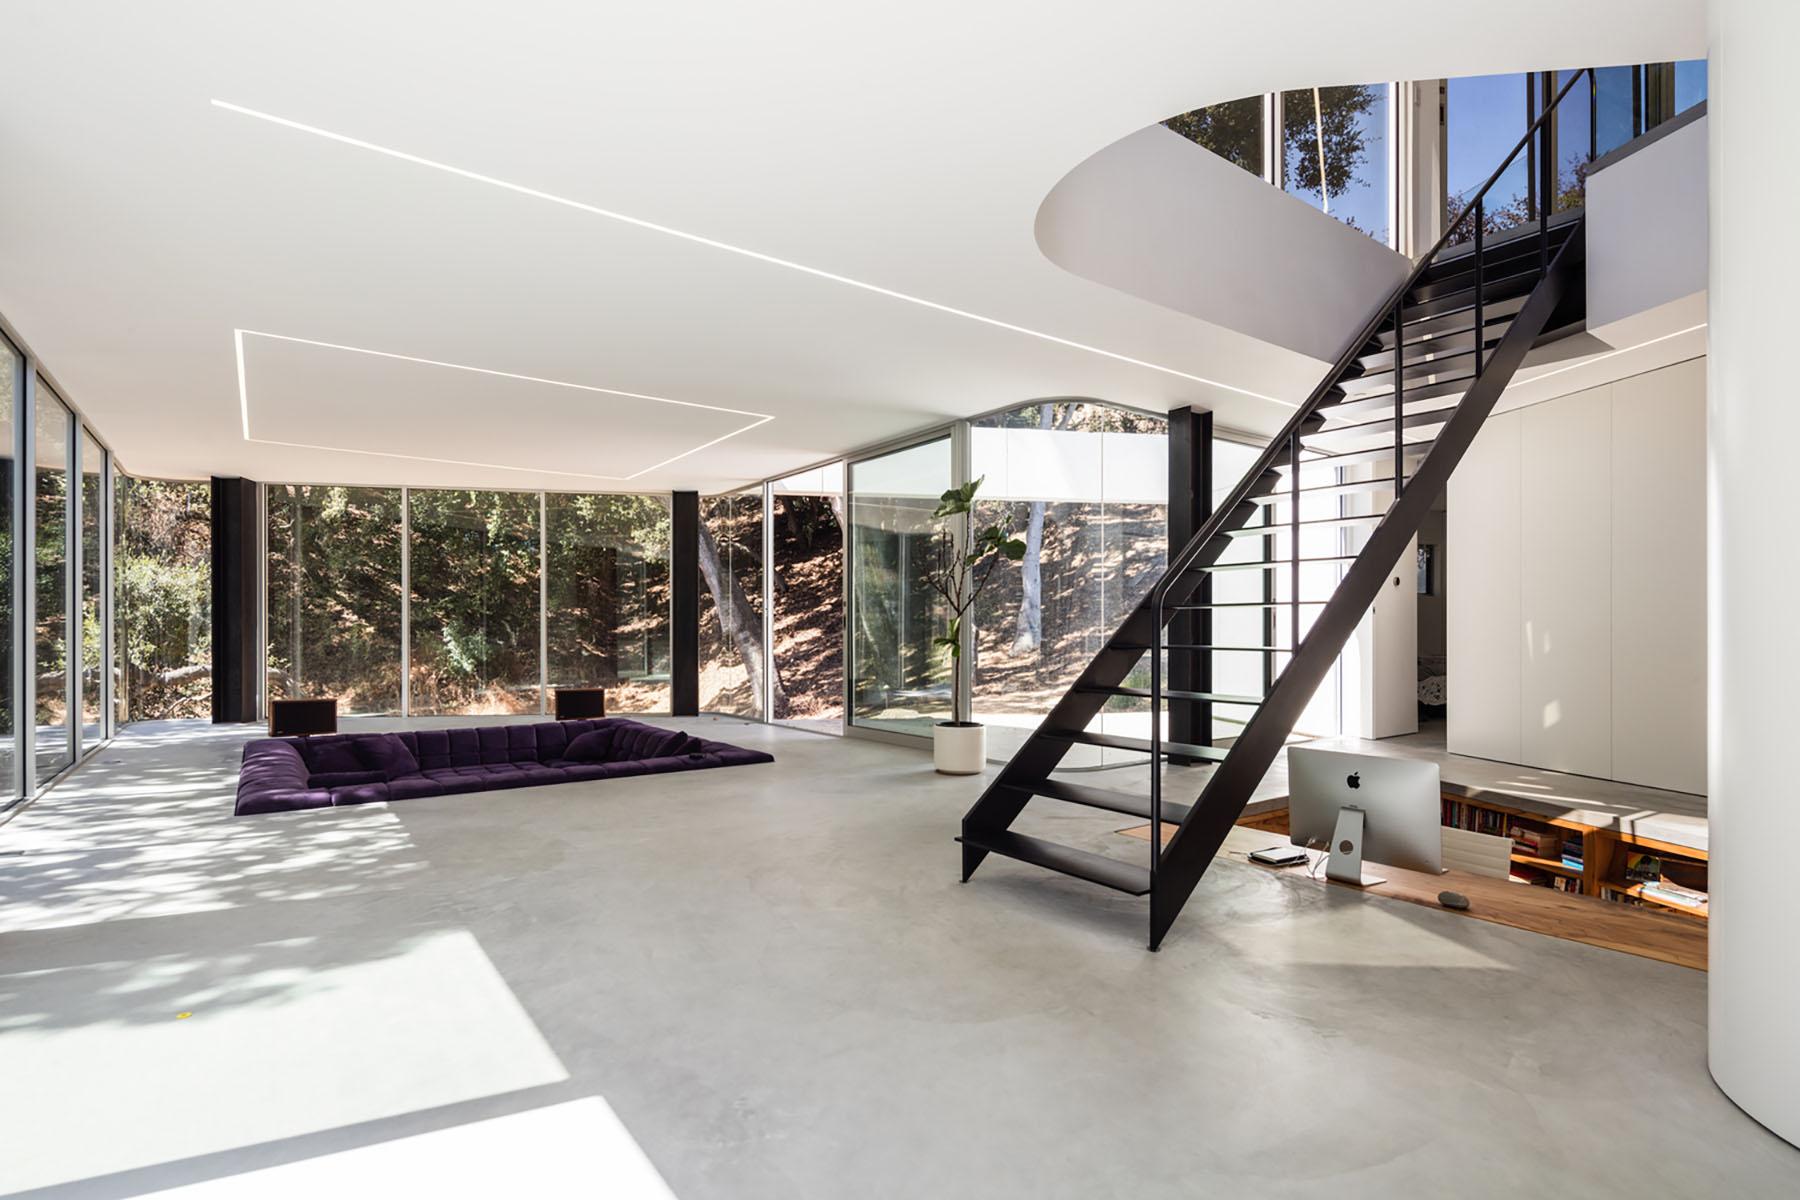 iGNANT-Architecture-Craig-Steely-Pam-Pauls-House-014b